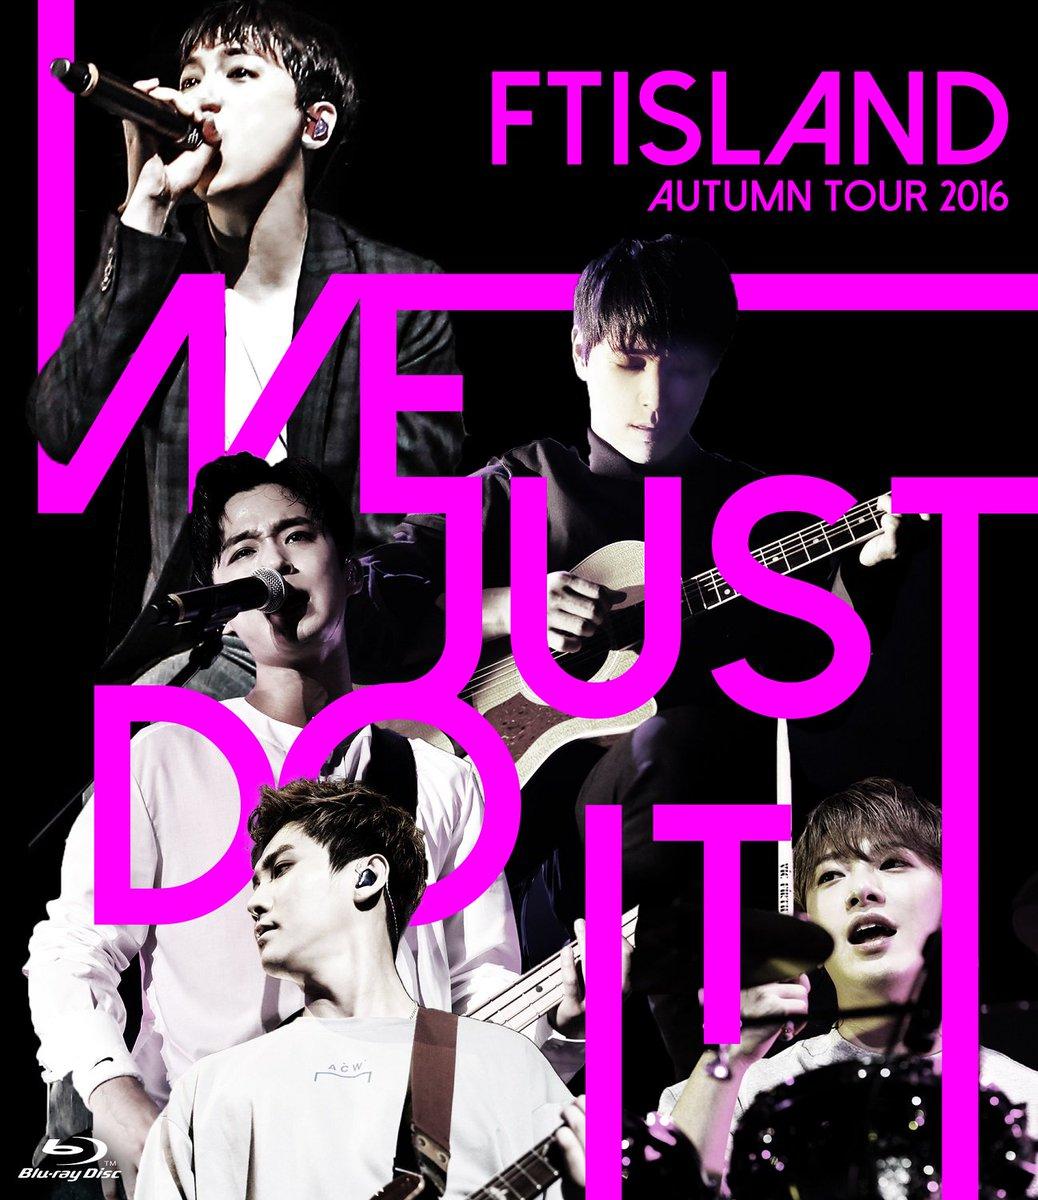 #FTISLAND 2月22日発売!最新LIVE映像作品『FTISLAND AUTUMN TOUR 2016 -WE JUST DO IT-』ジャケット写真公開! FTISLANDに会えるチャンス!購入者応募特典あり!!